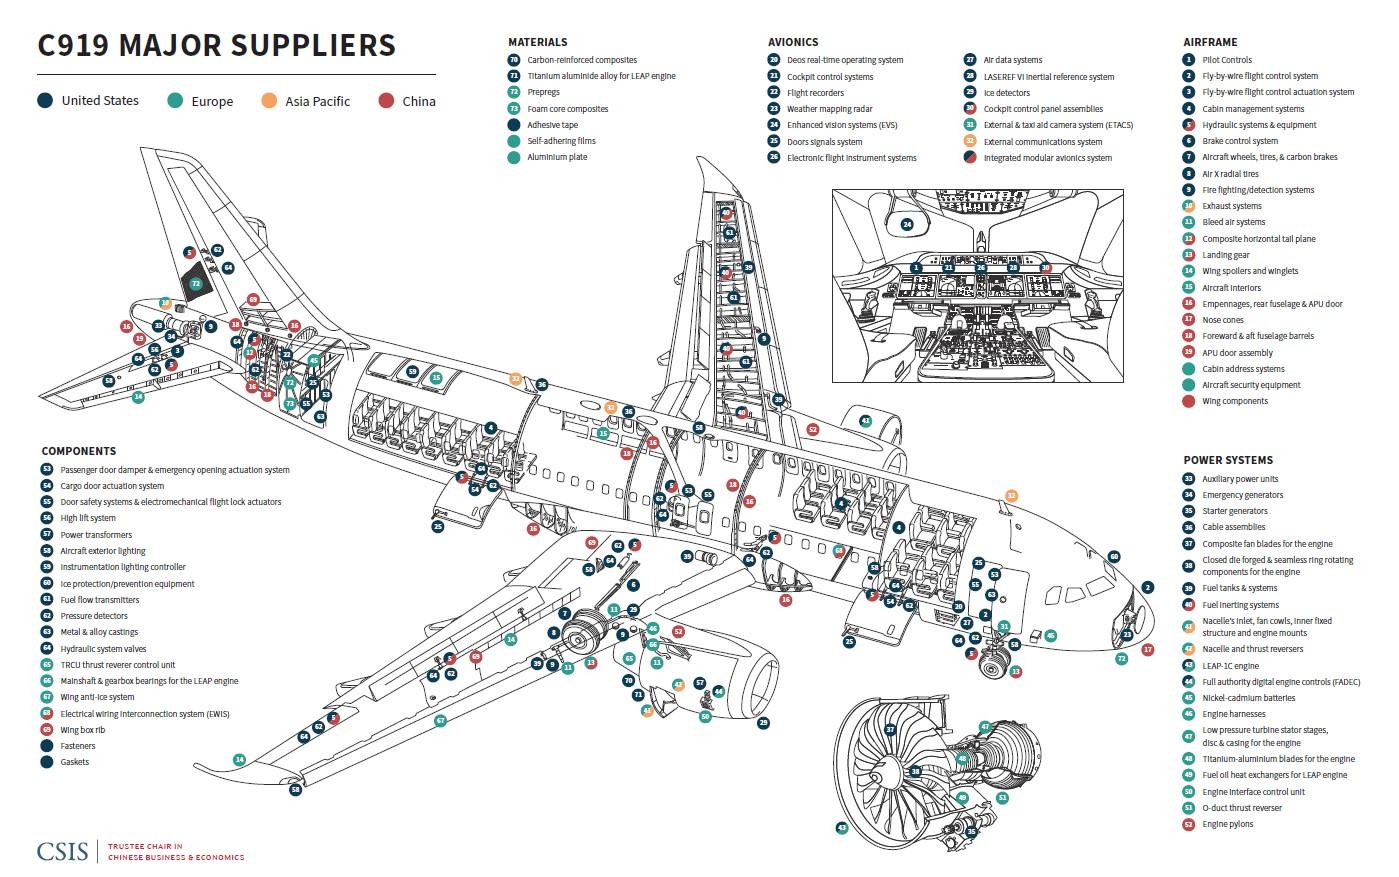 201203_Kennedy_C919_Major_Suppliers.jpg